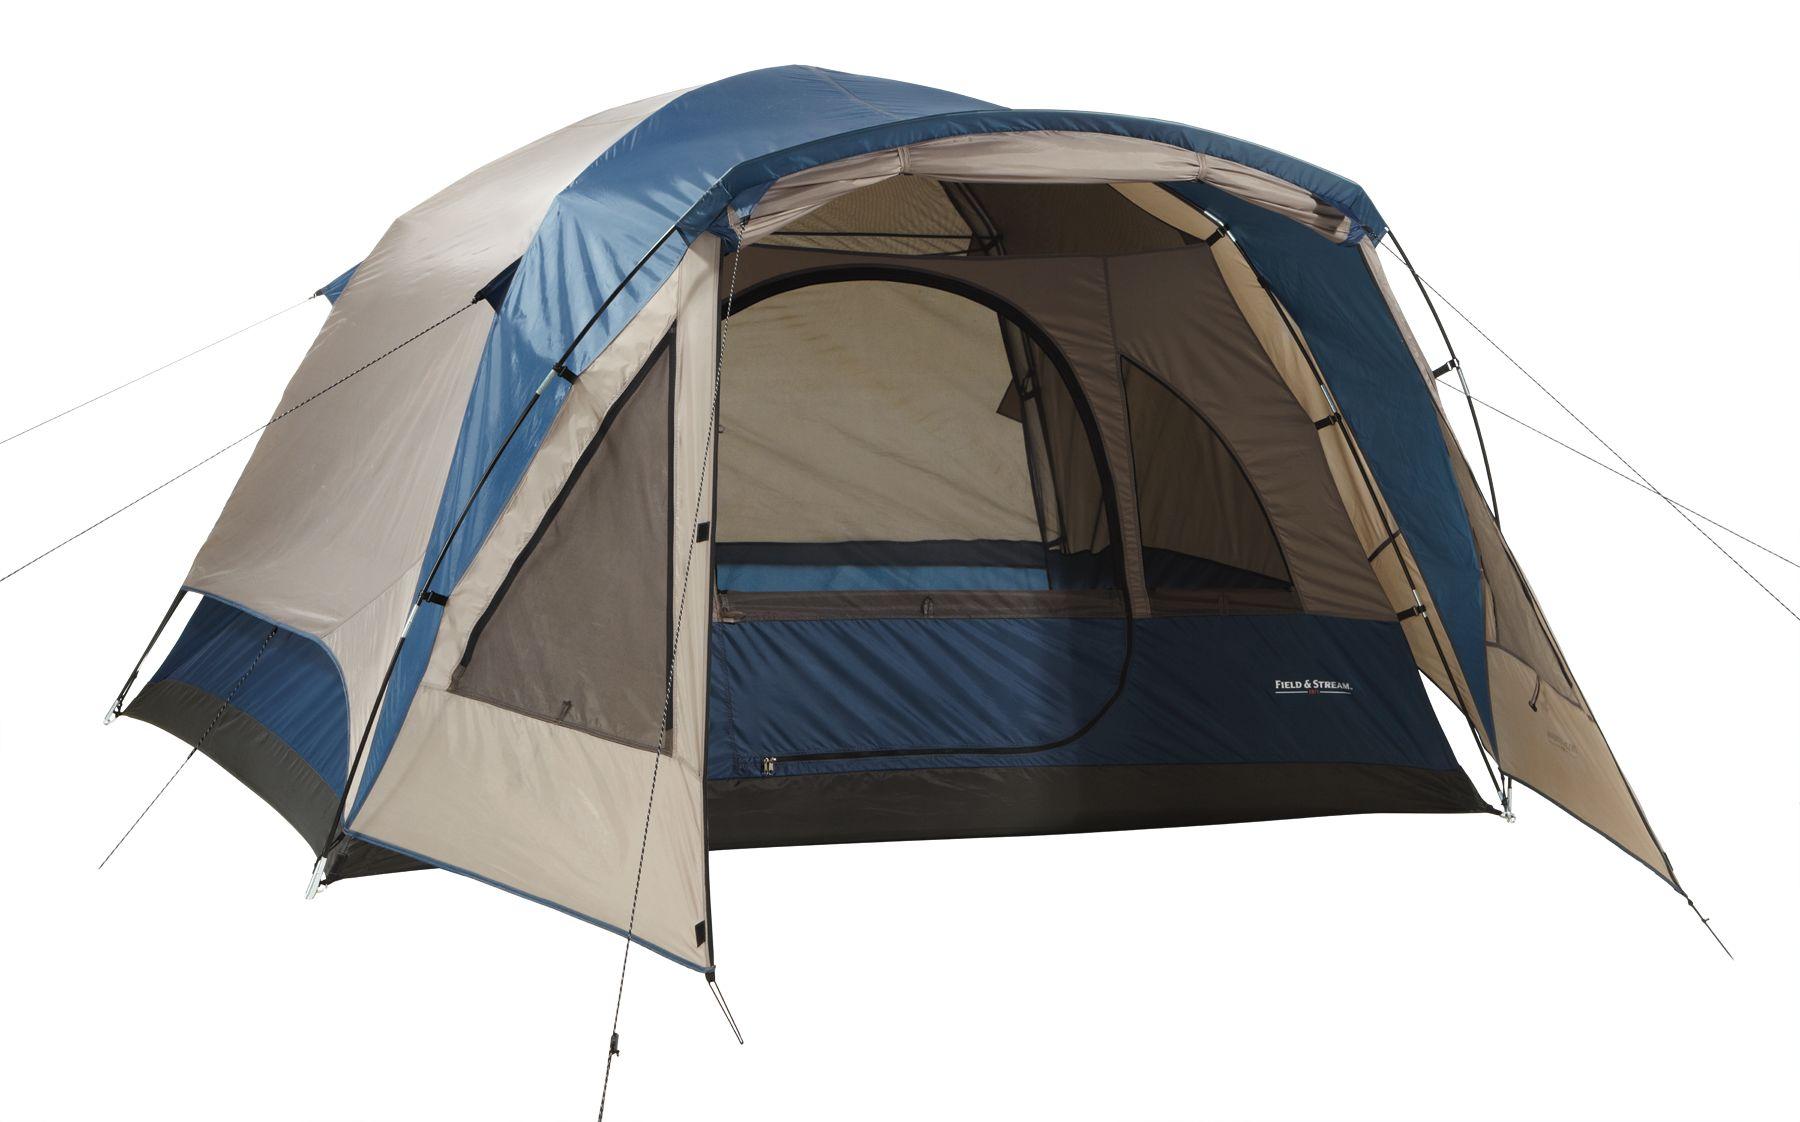 Best Tent 4 Person & Top Rated Sc 1 St OptimumTents